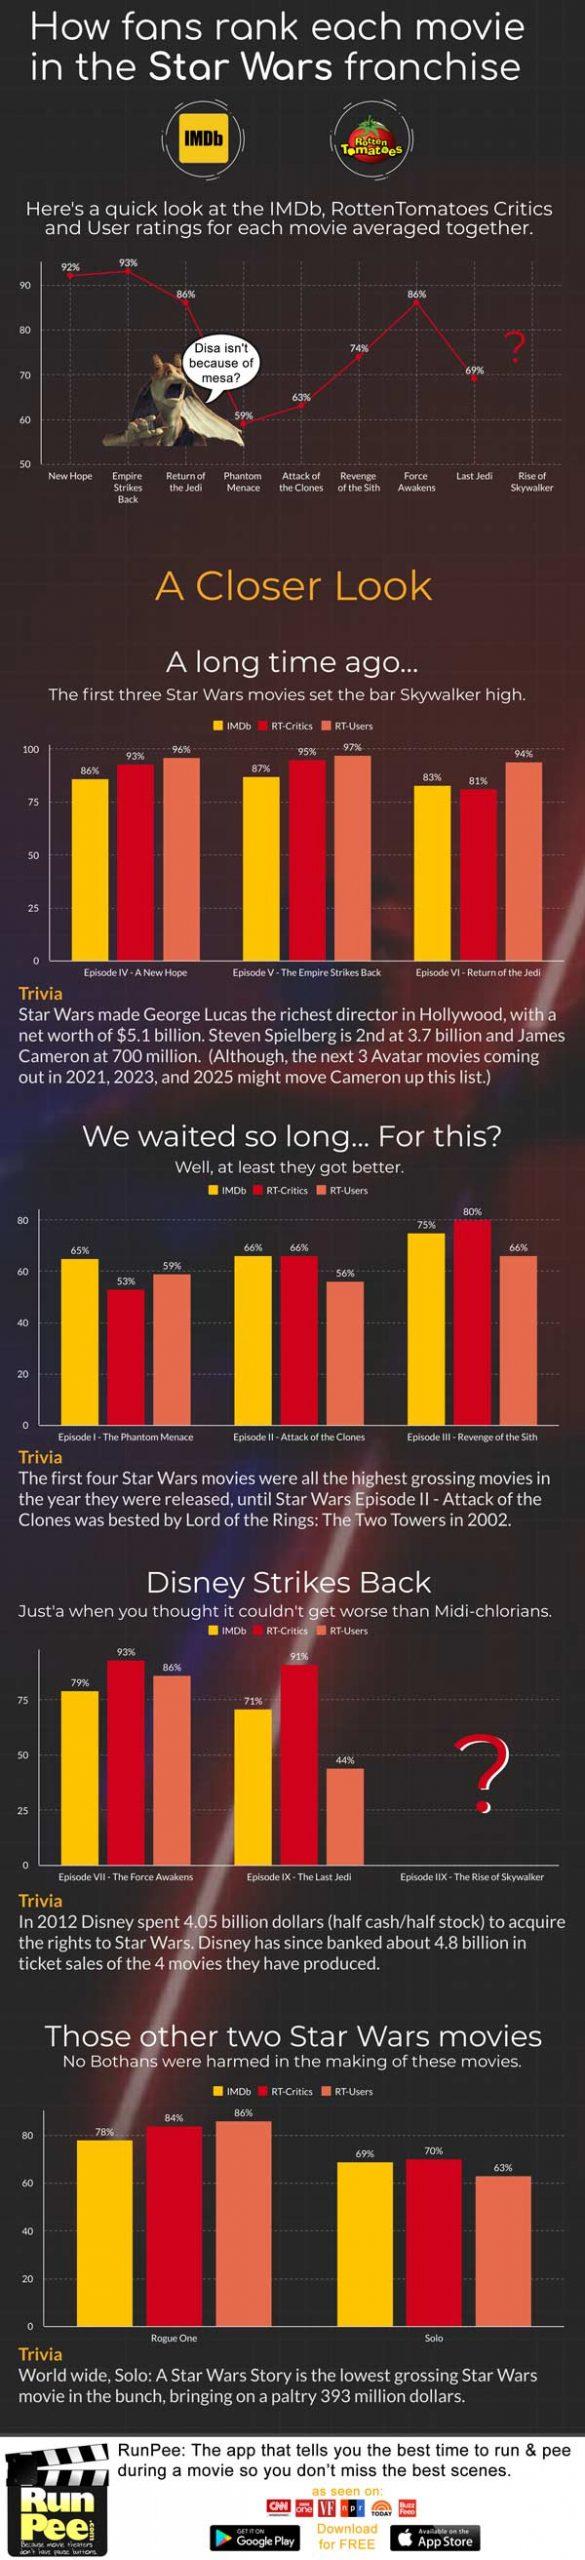 Infographic of every star wars movie fan-rank via imdb and rottentomatos.